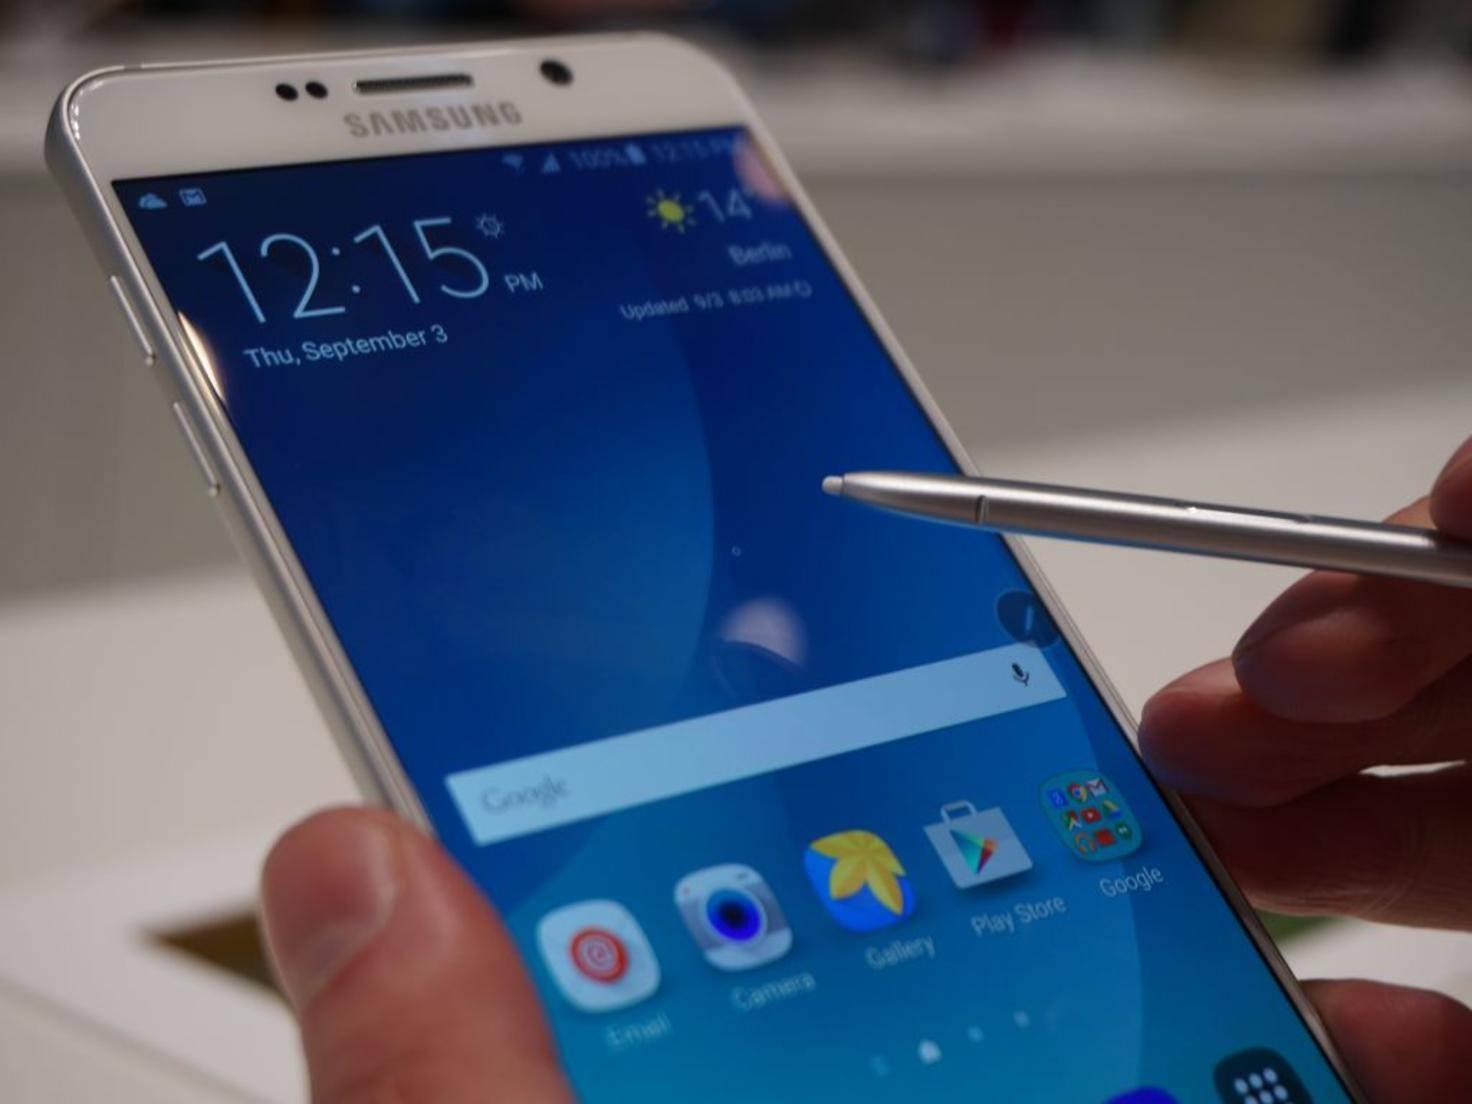 Samsung Galaxy Note 5 2